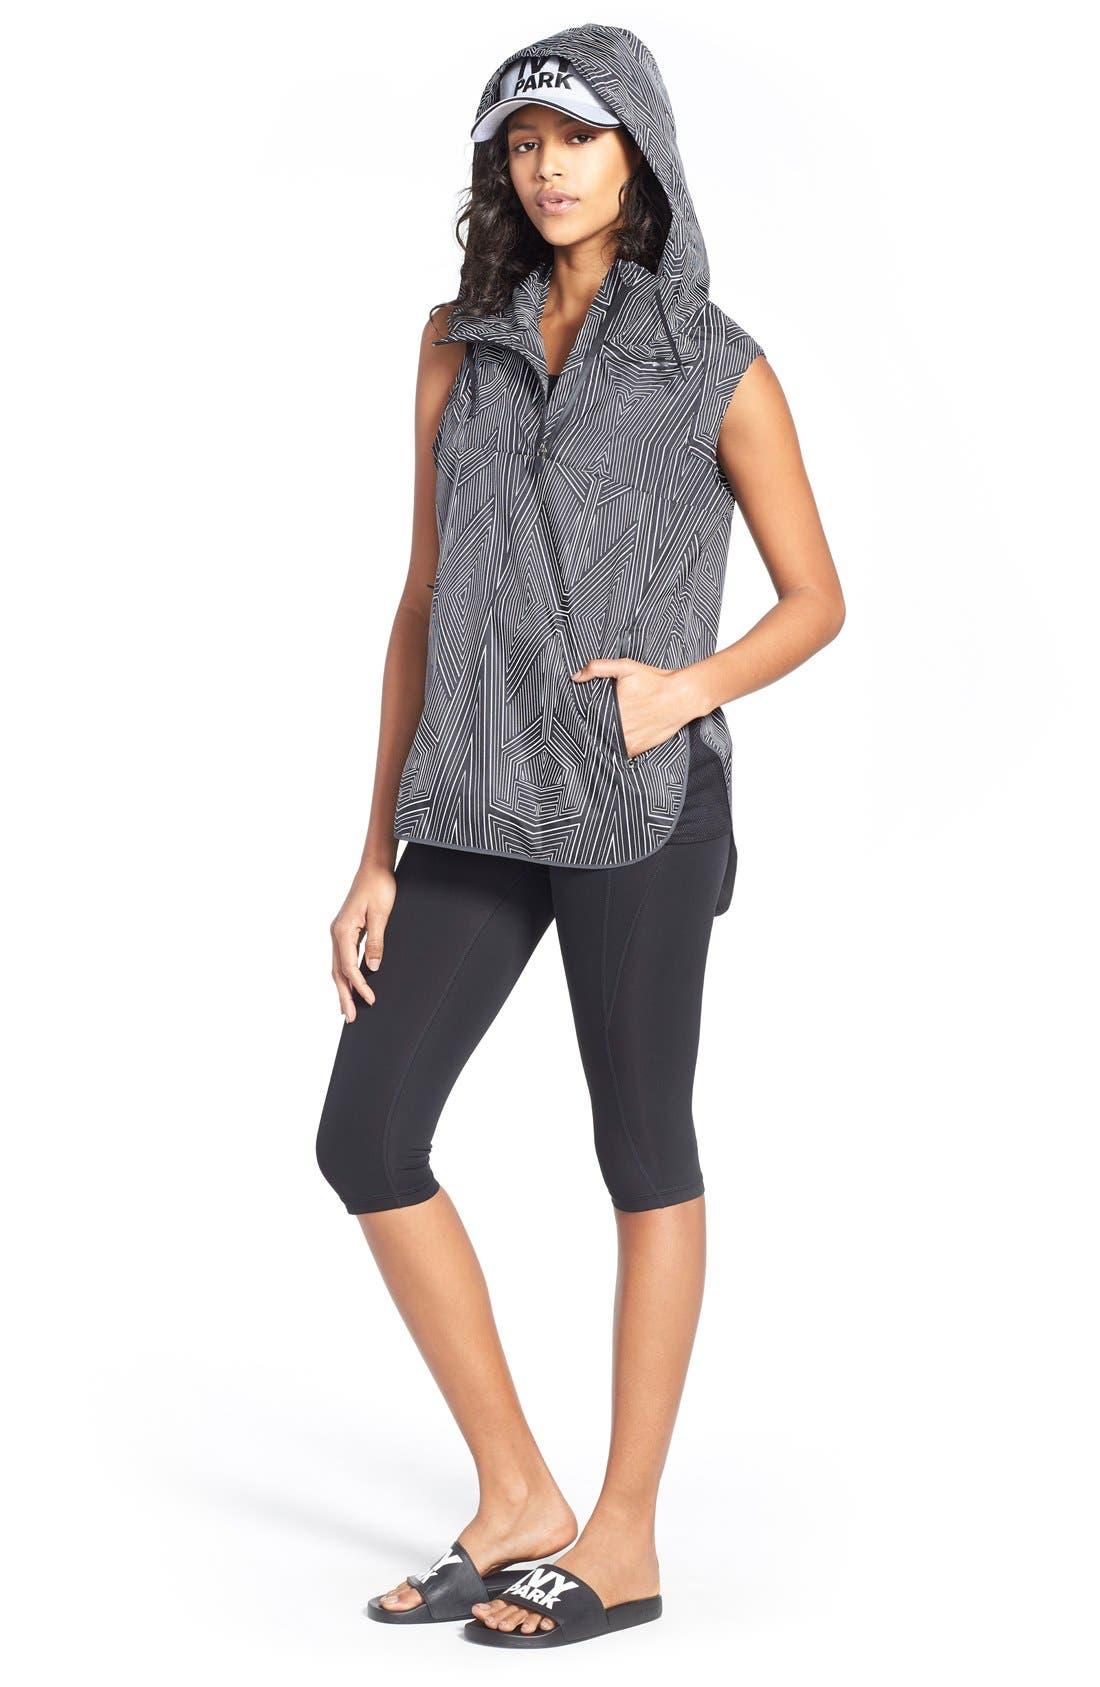 IVY PARK® Jacket, Bra Top & Capri Leggings